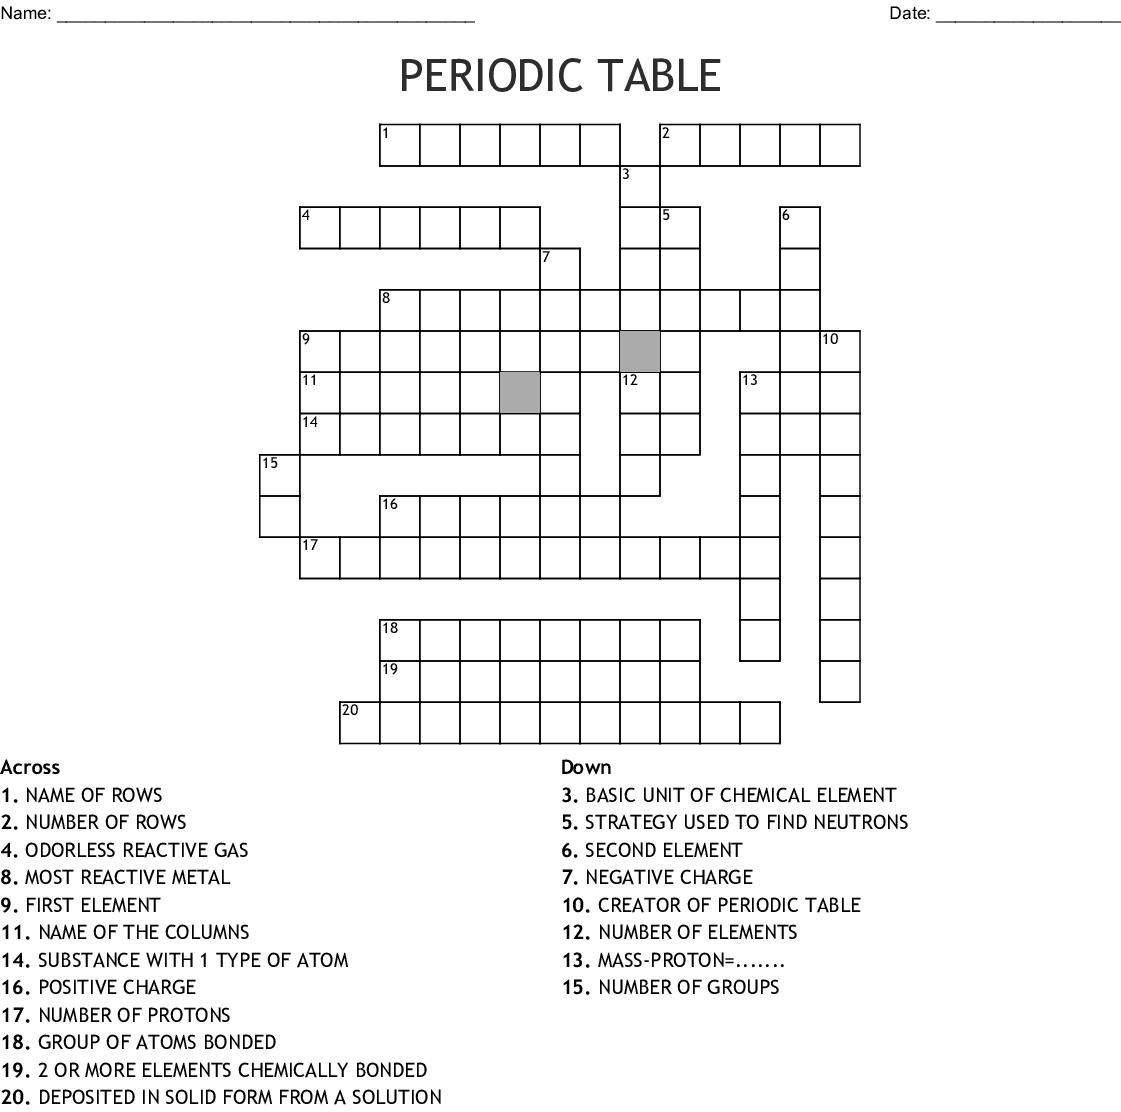 Periodic Table Basics Crossword